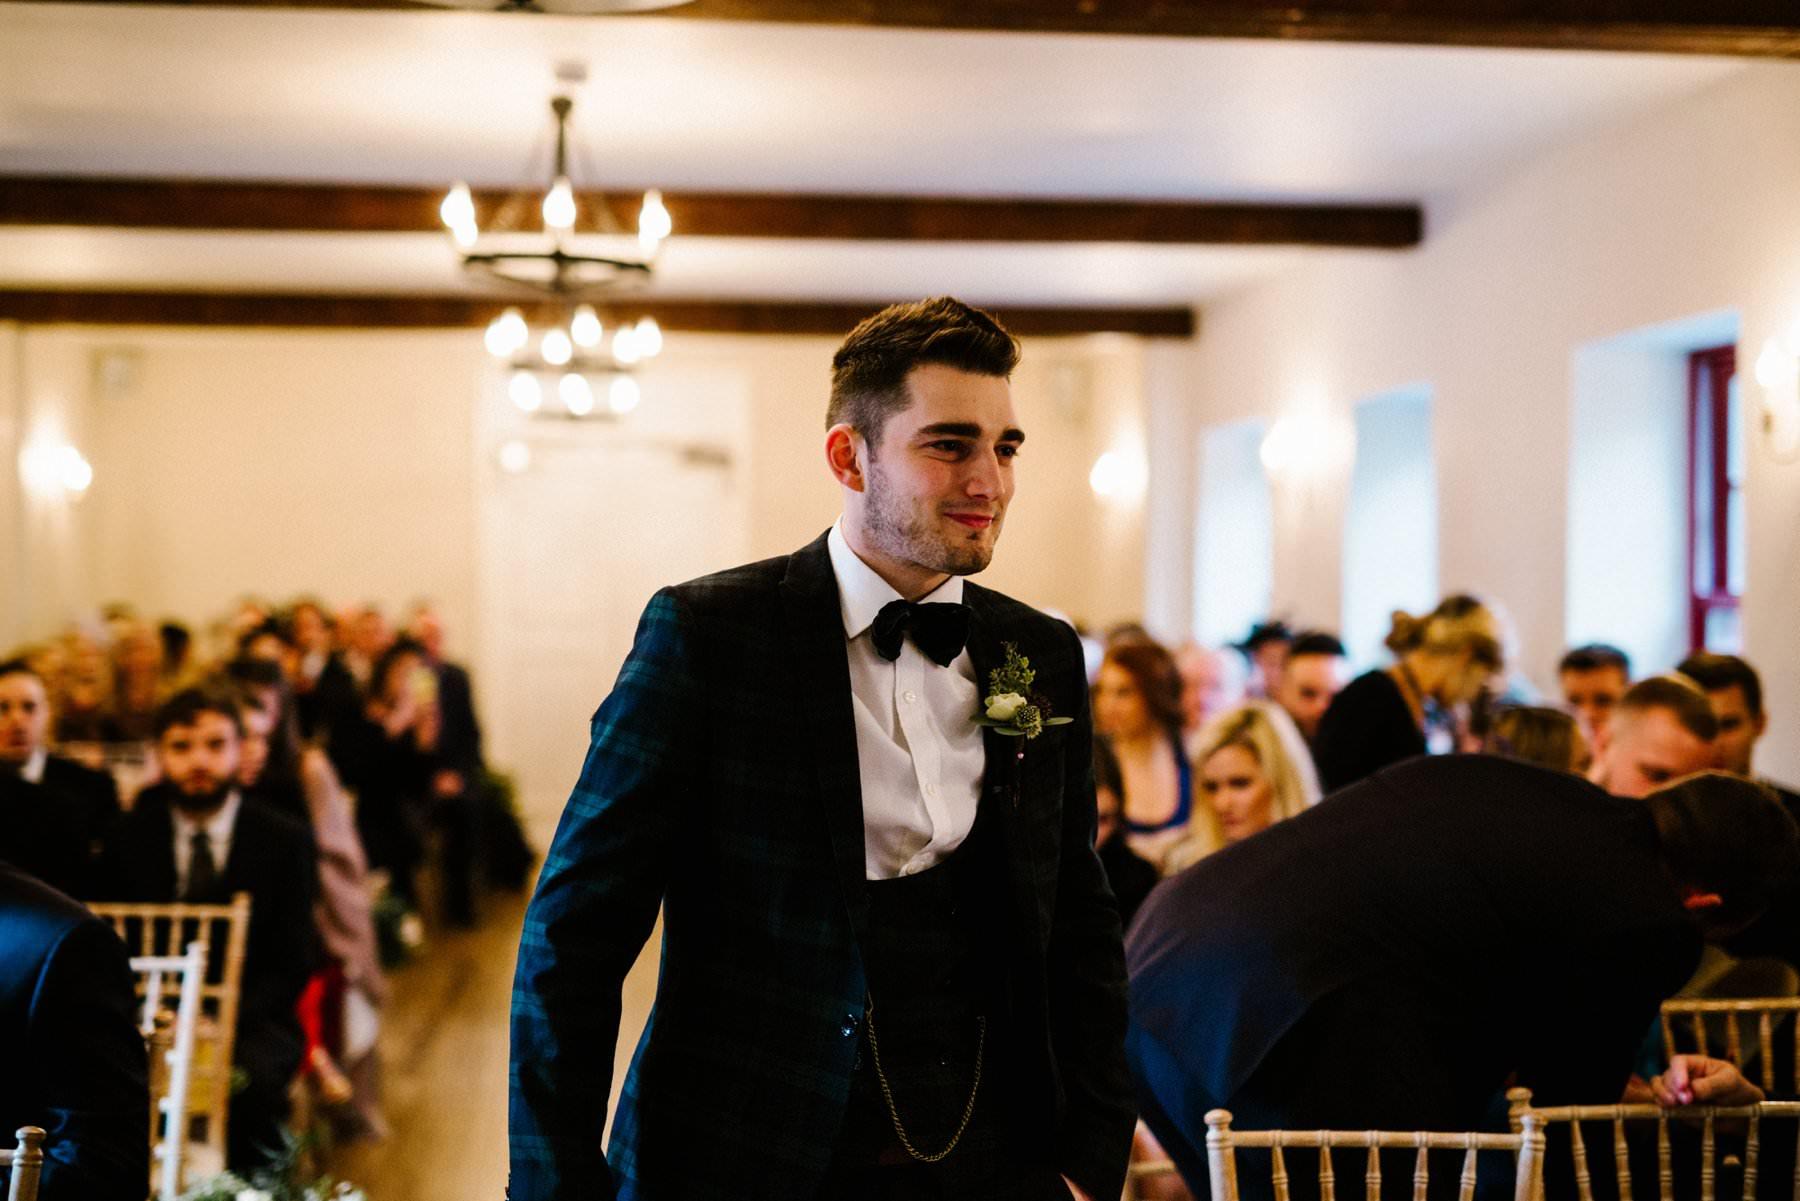 Dapper groom on his wedding day